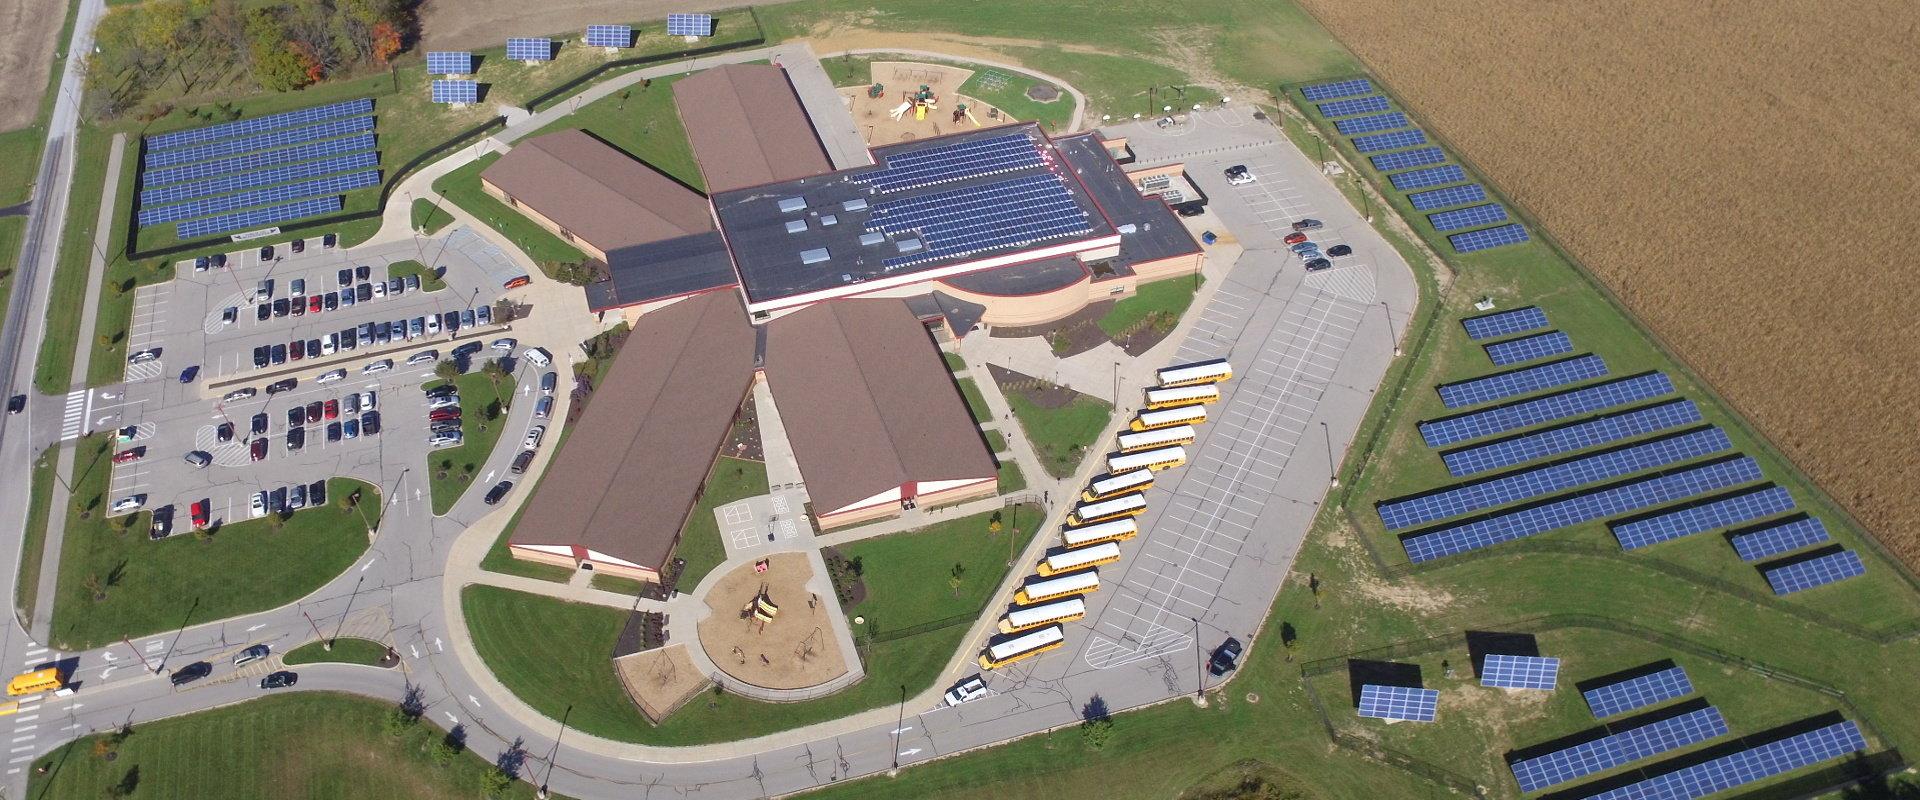 myCleantechSolarTracker™ Solaranalage - Schule